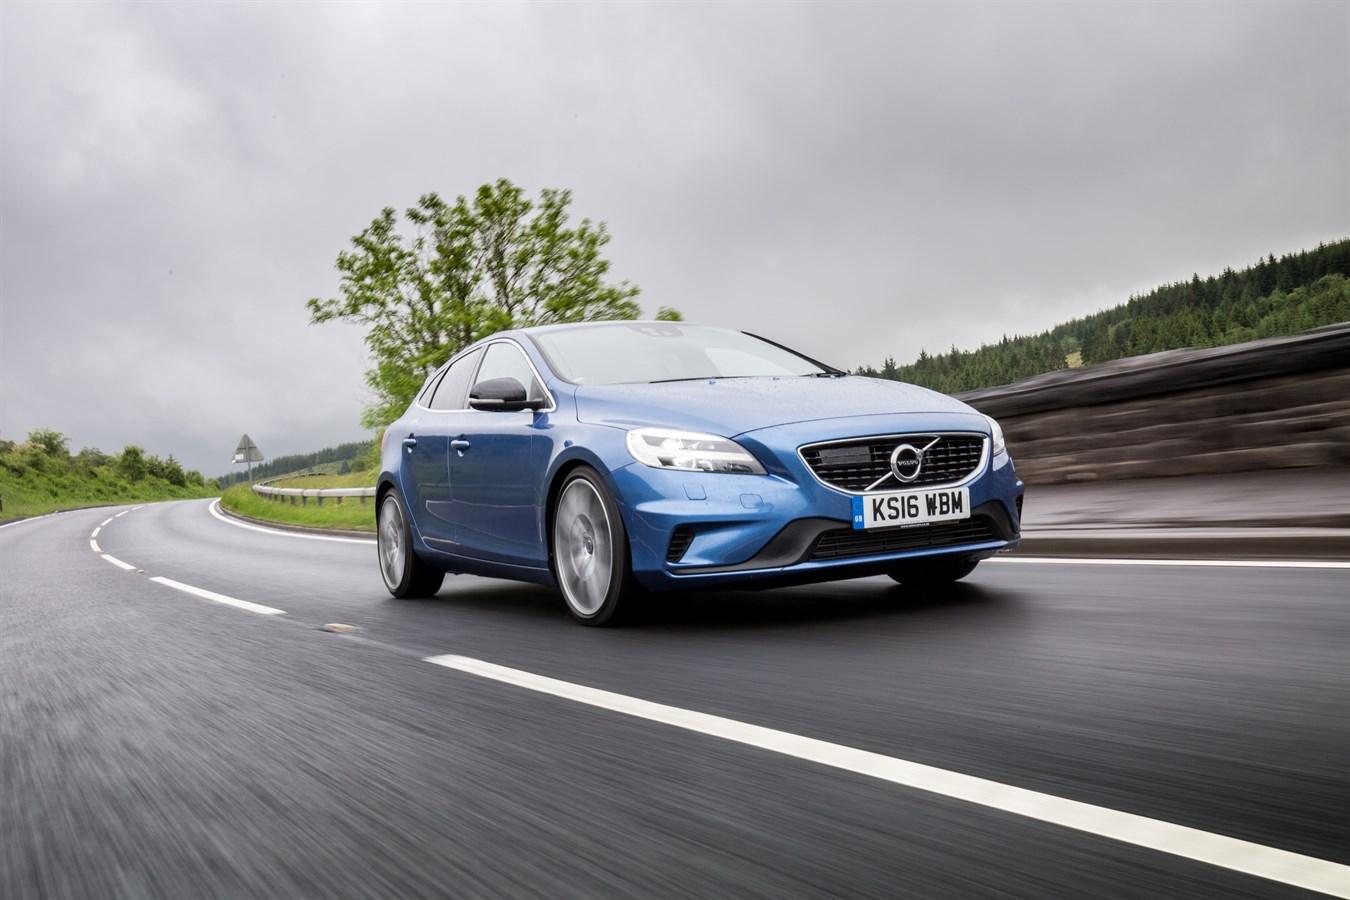 volvo v40 fitted with polestar performance parts volvo. Black Bedroom Furniture Sets. Home Design Ideas